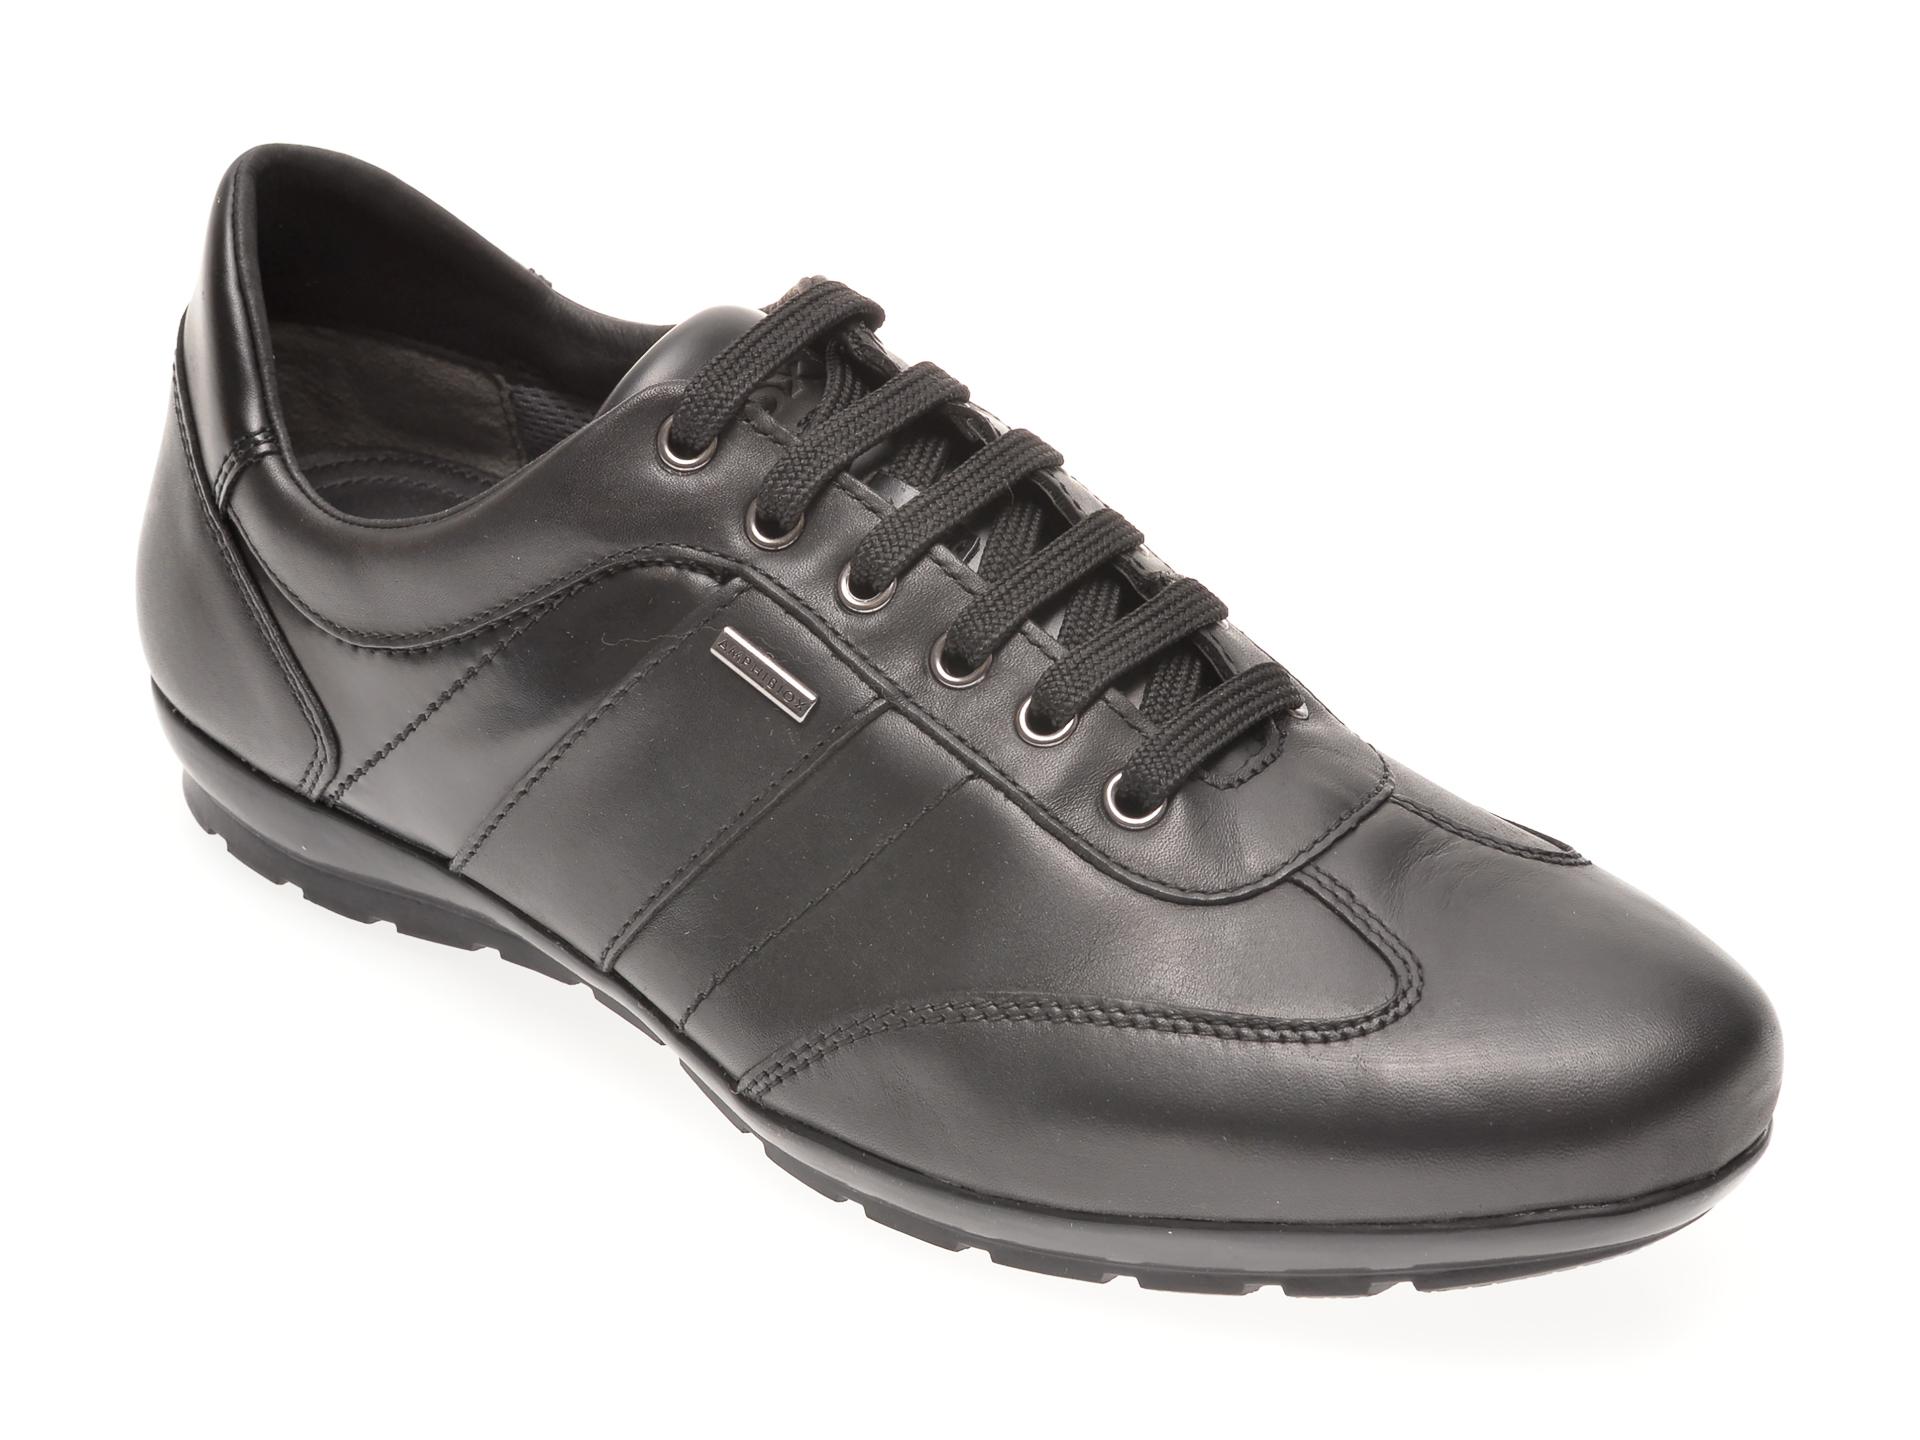 Pantofi GEOX negri, U44P2B, din piele naturala imagine